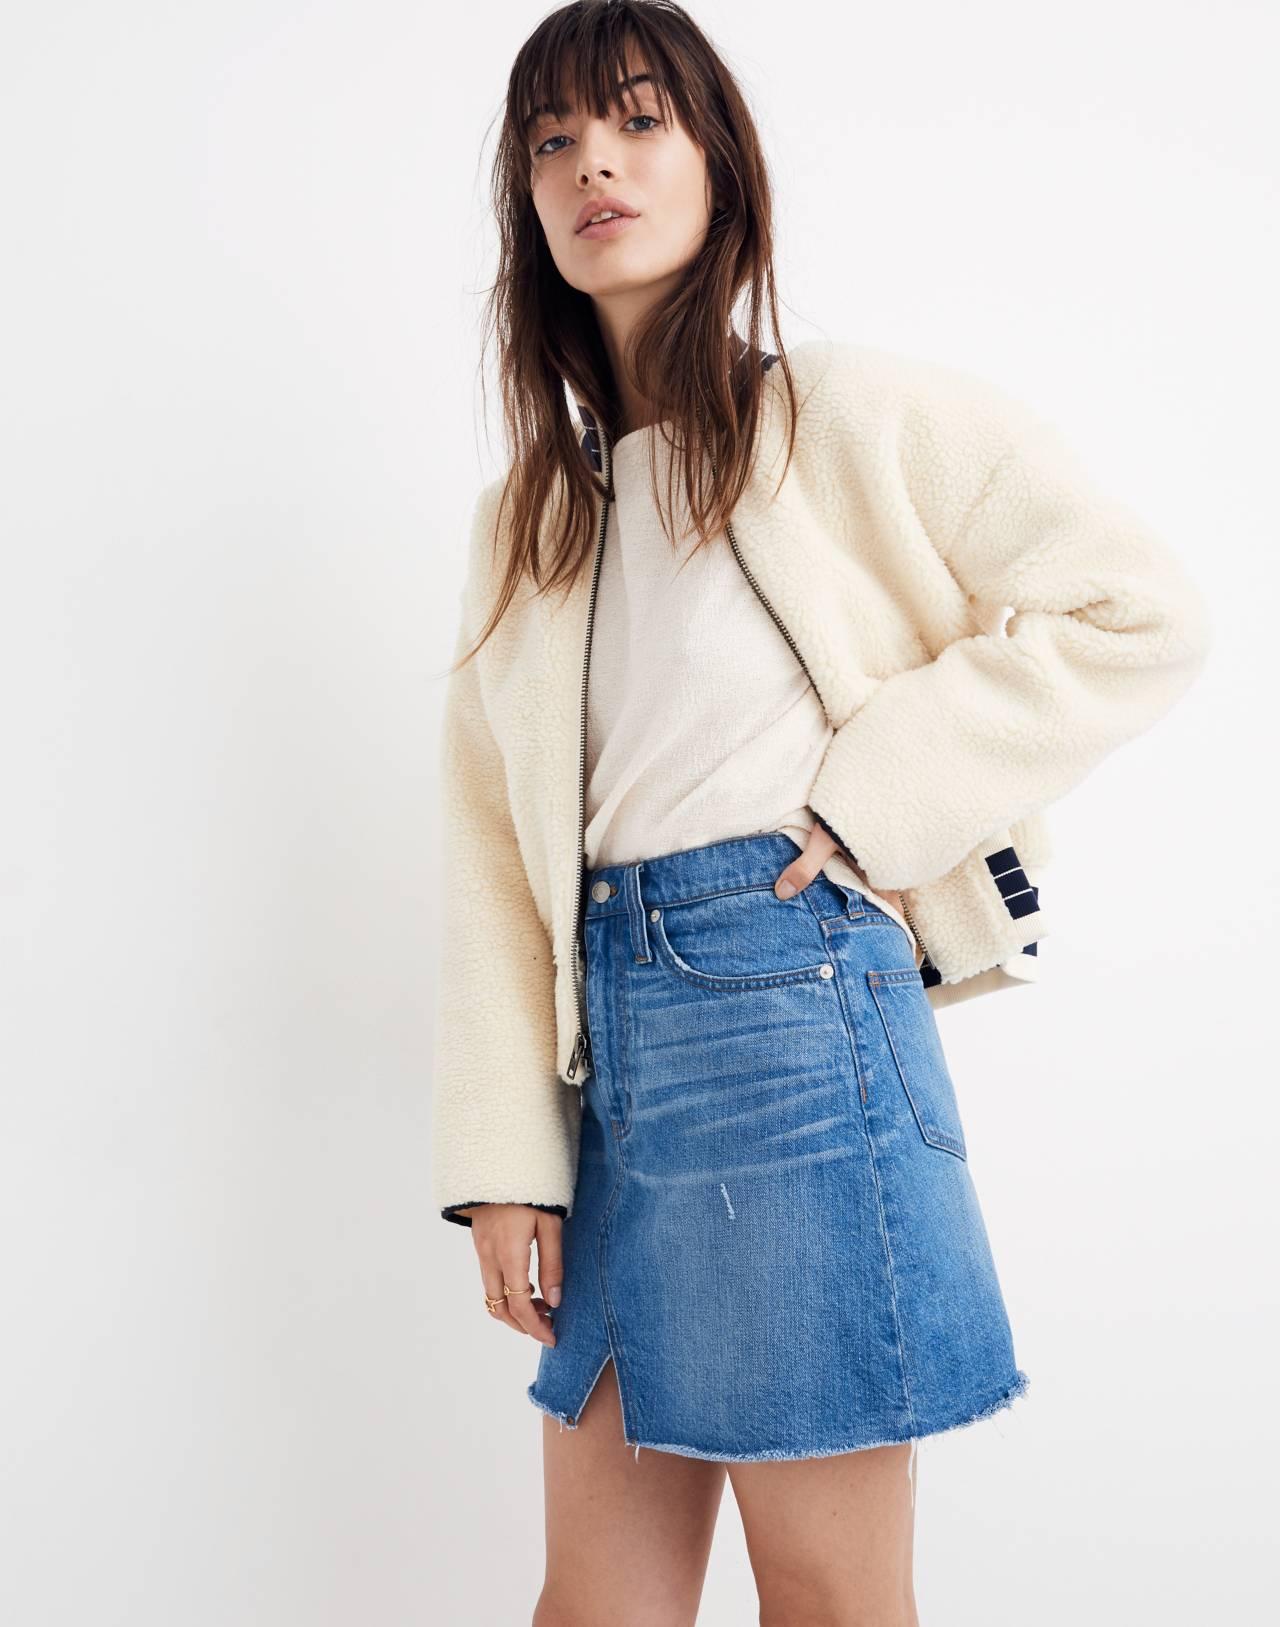 Rigid Denim A-Line Mini Skirt in Keene Wash: Cutout Edition in keene wash image 2